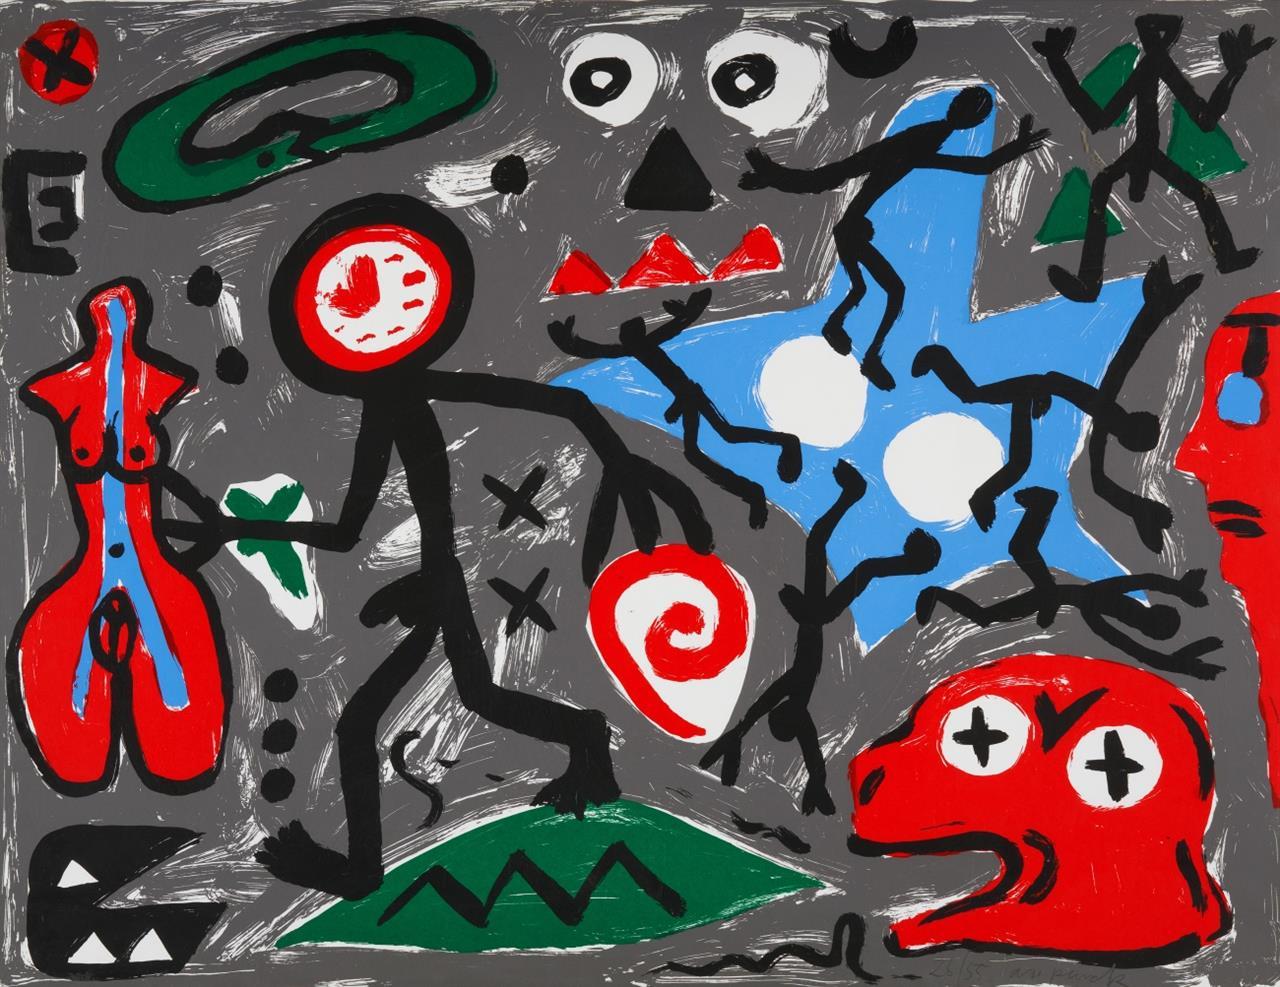 A.R. Penck. Ohne Titel. Farbserigraphie. Signiert. Ex. 26/55.